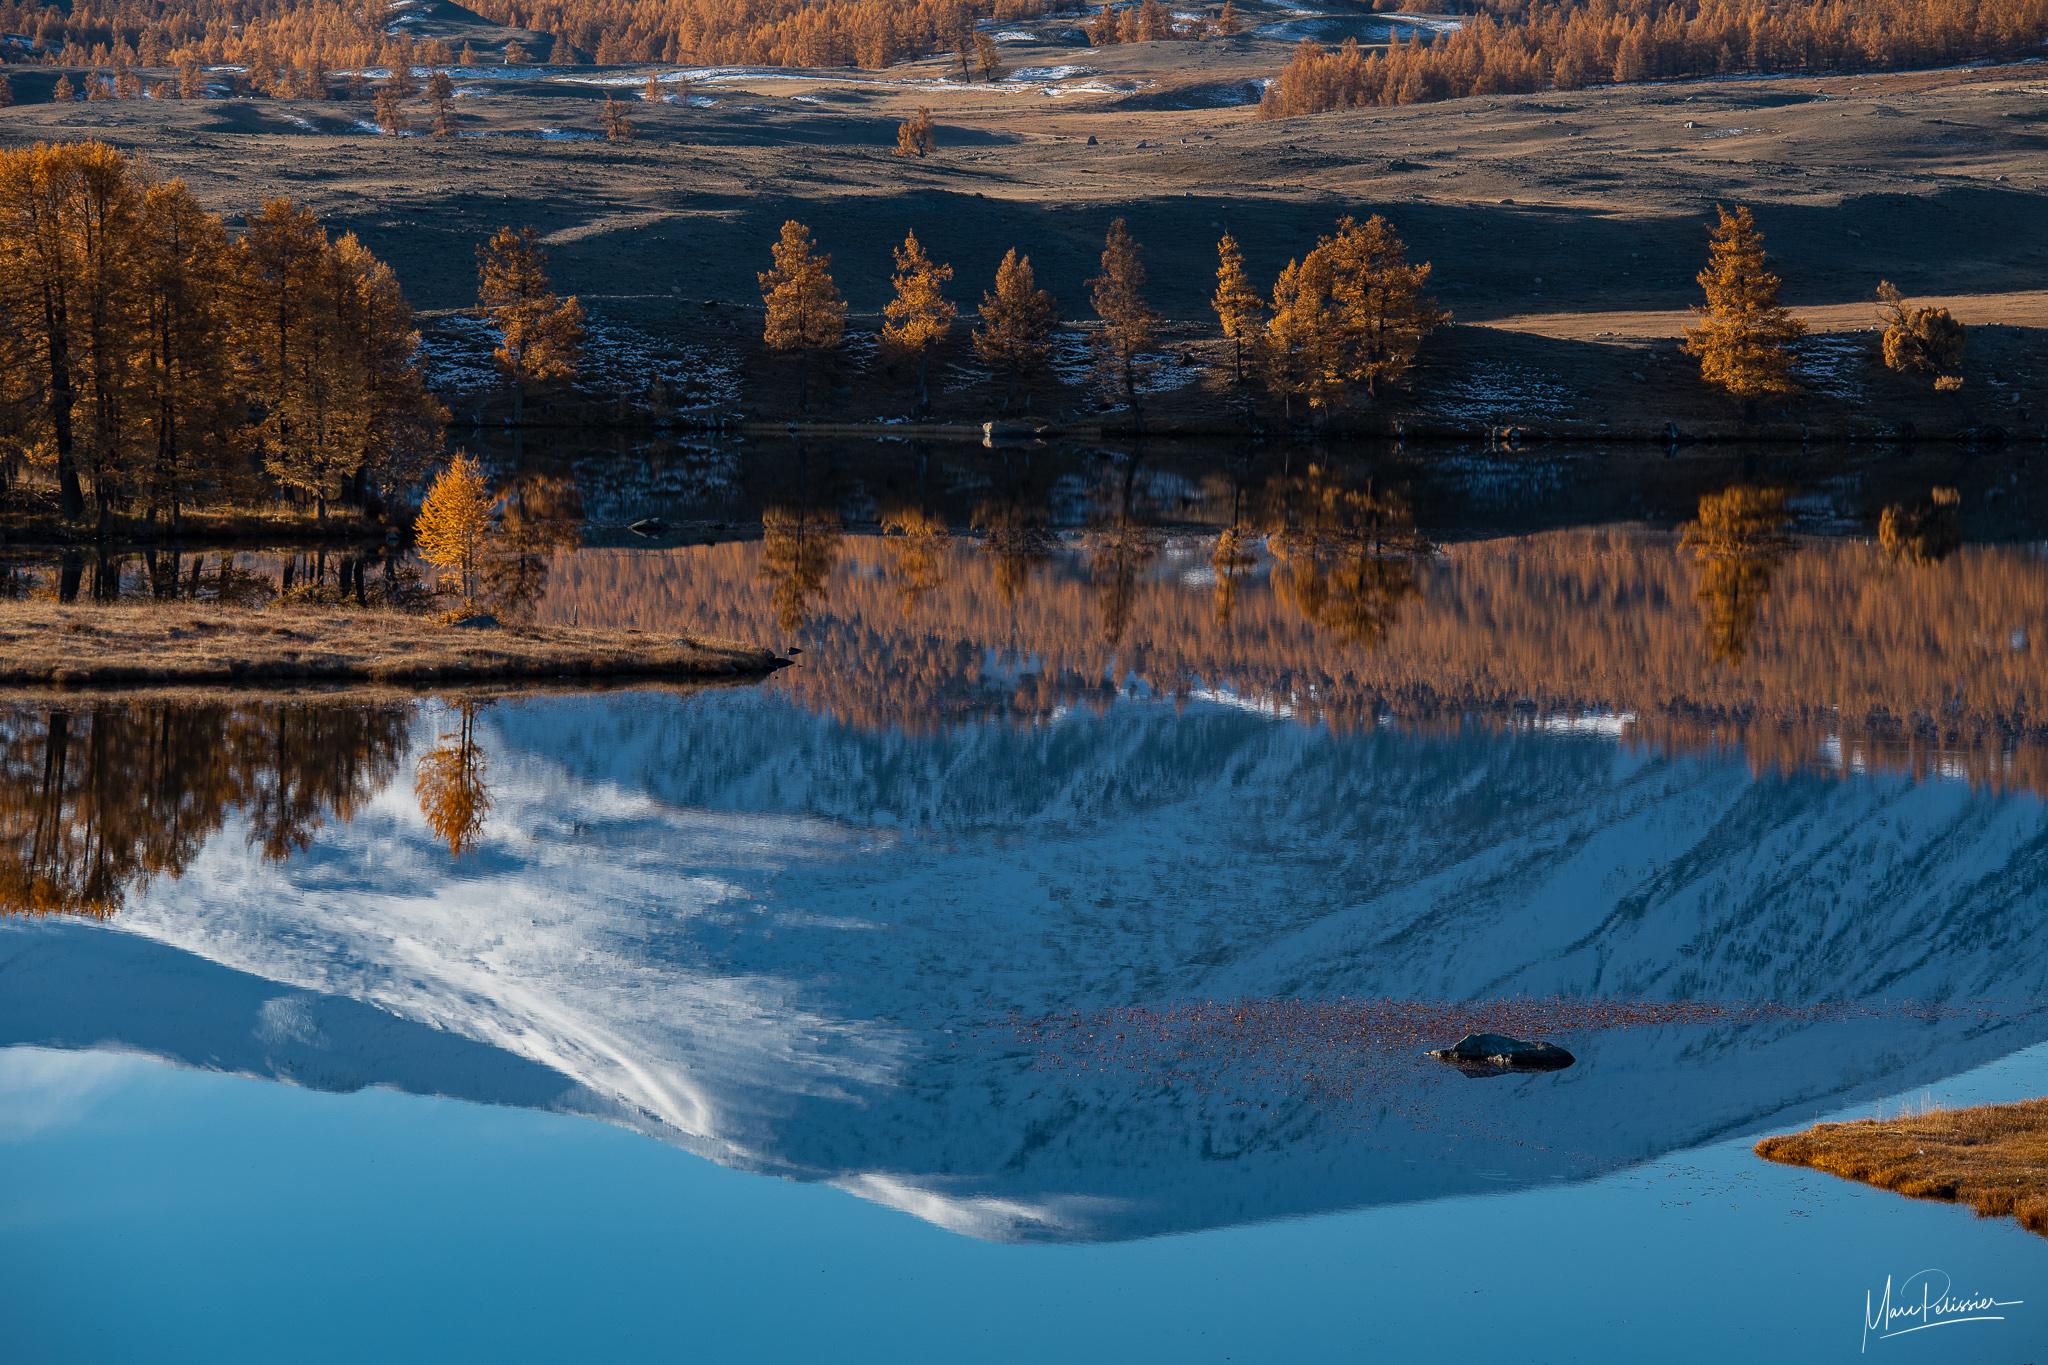 Sunrise fall colors in Altai Tavan Bogd, Mongolia